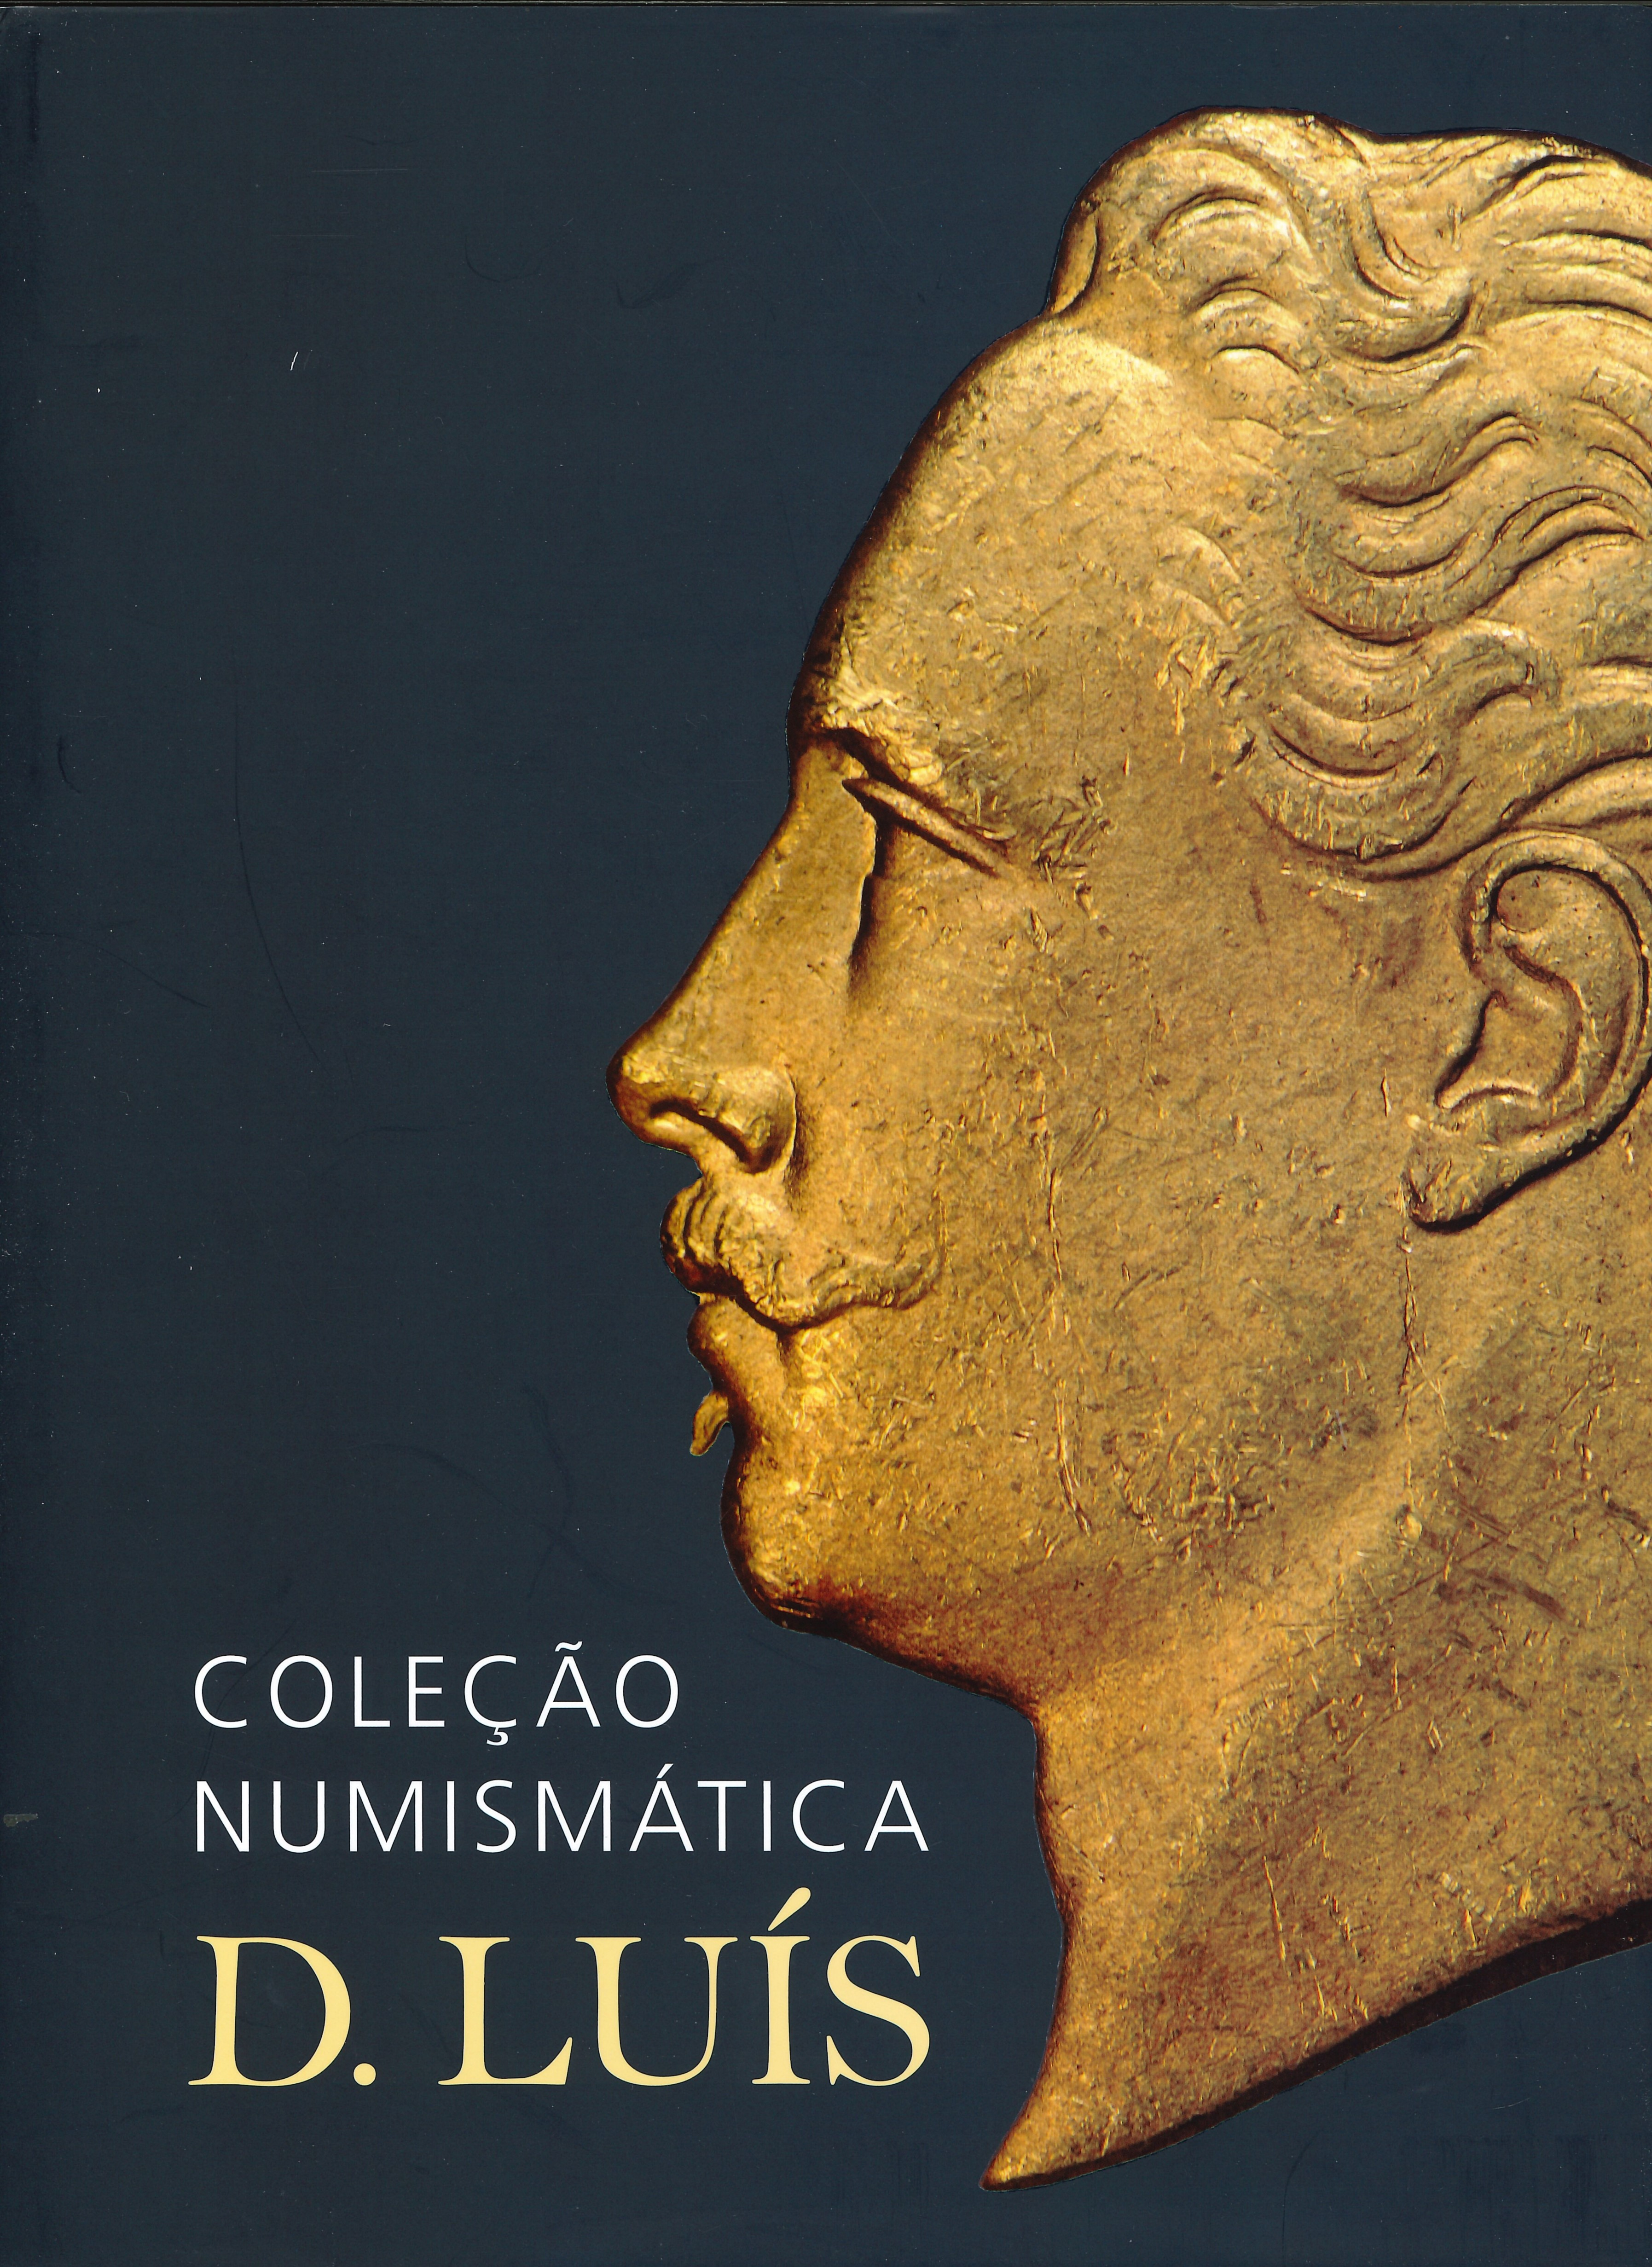 Numismática D. Luís.jpg